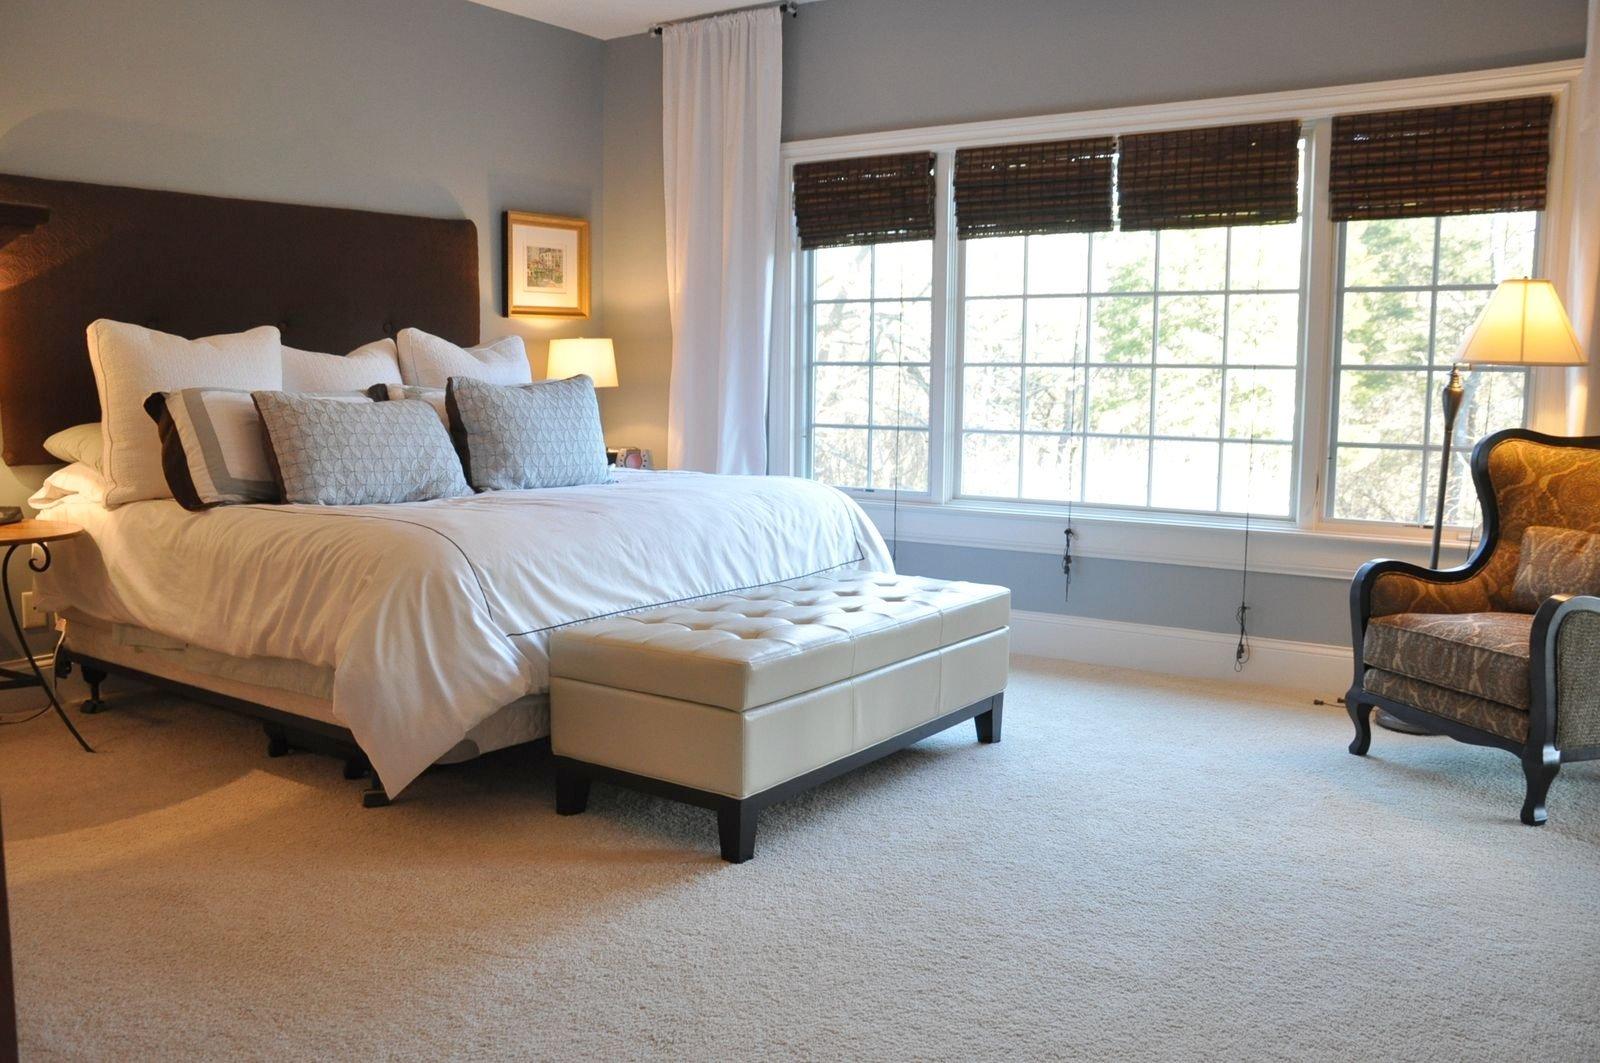 Bedroom Furniture Benches   Wallpress 1080p HD Desktop